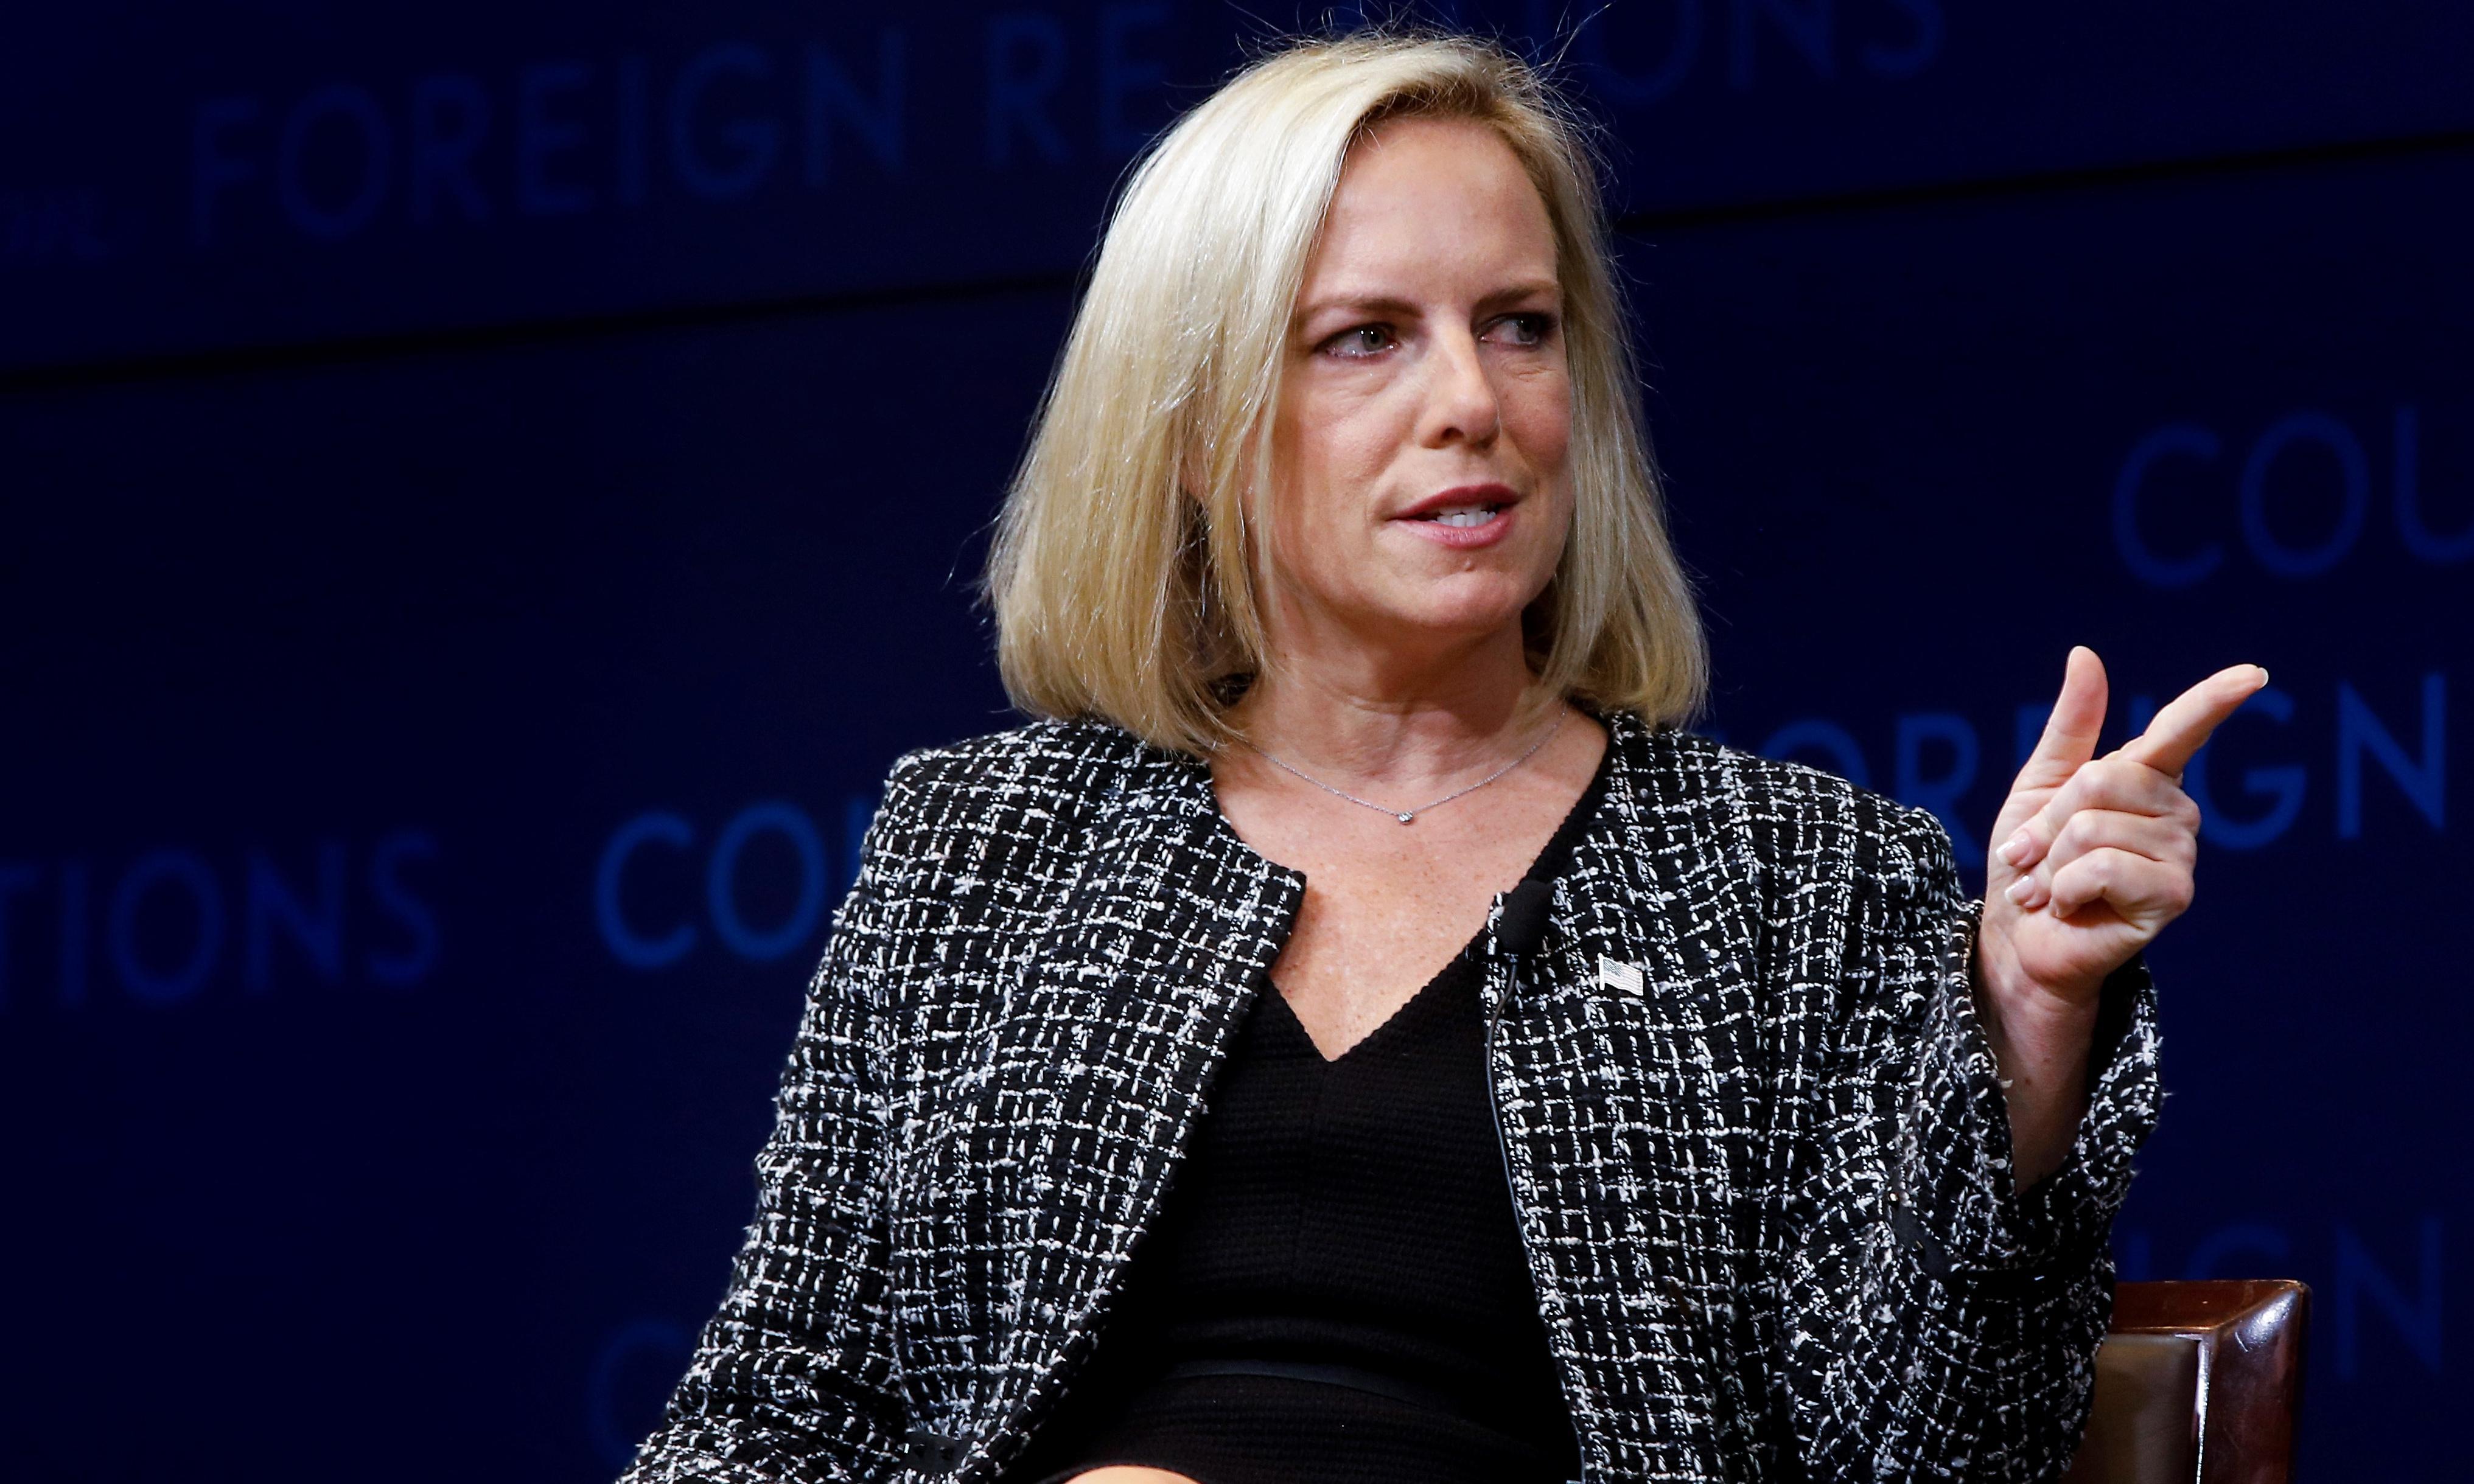 'I don't regret enforcing the law': Nielsen defends family separation at summit